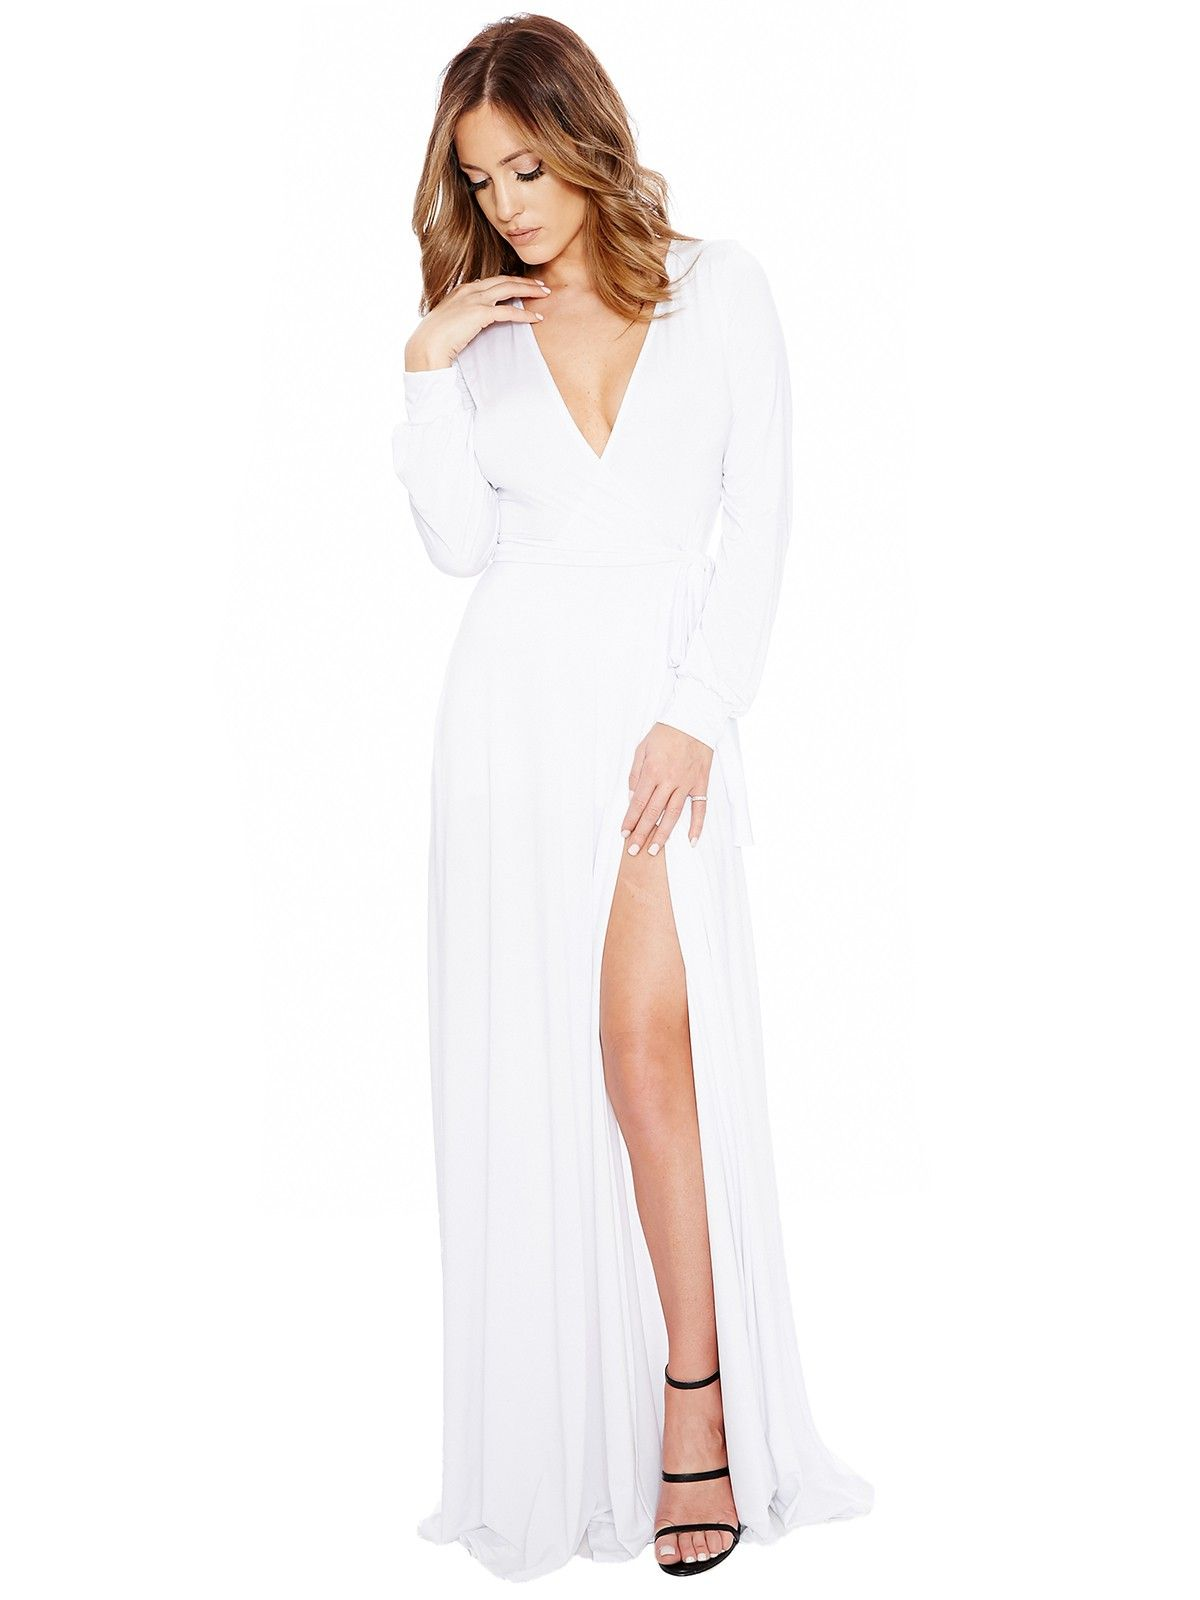 Turnt up to the maxi dress dresses womens nakedwardrobe